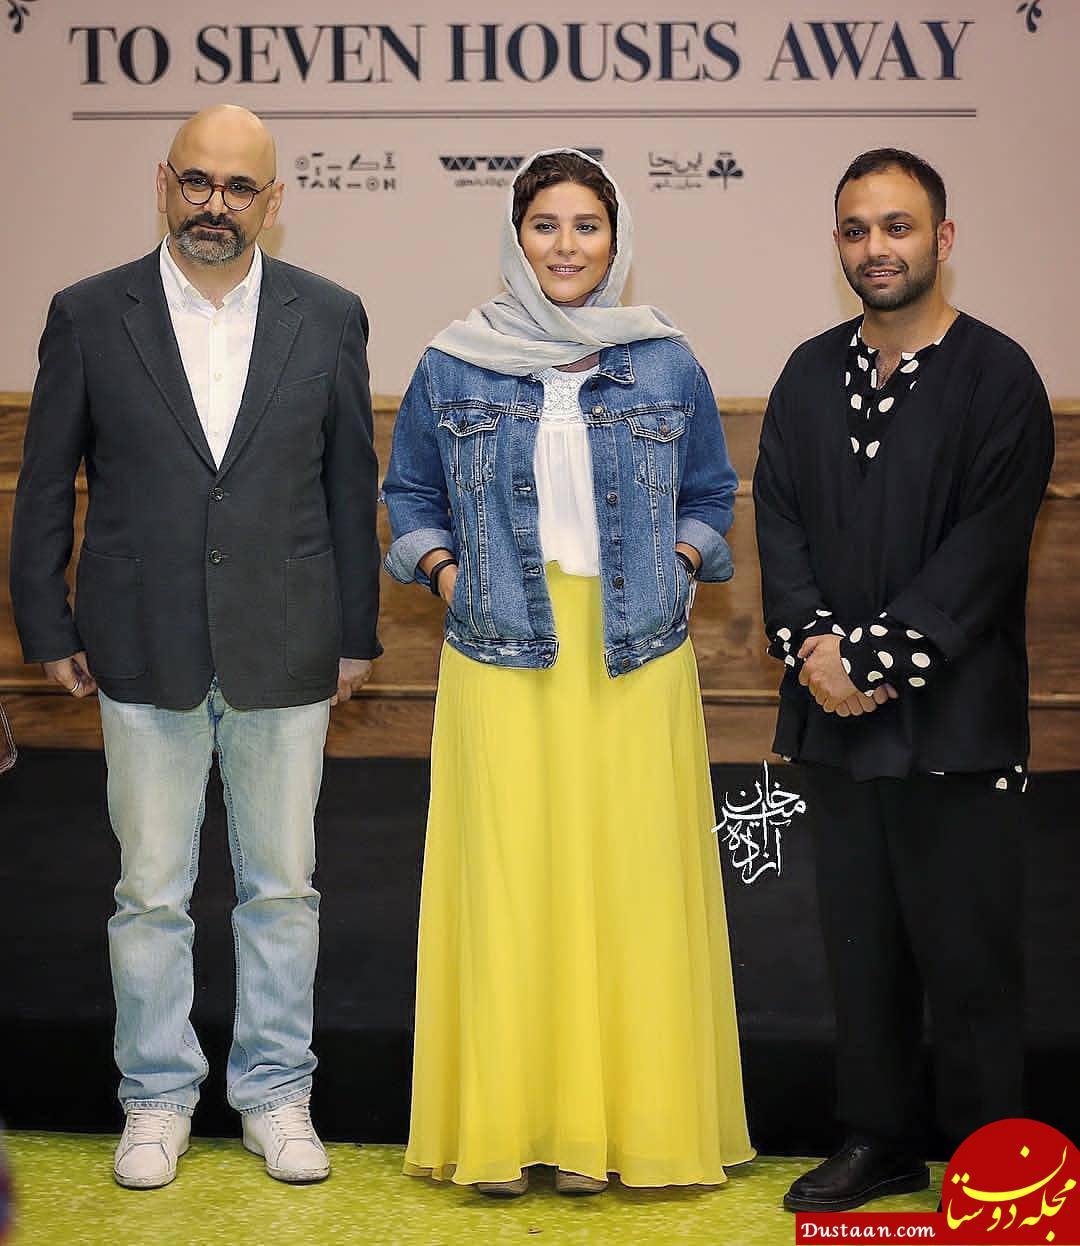 www.dustaan.com تیپ متفاوت سحر دولتشاهی در یک مراسم! +عکس